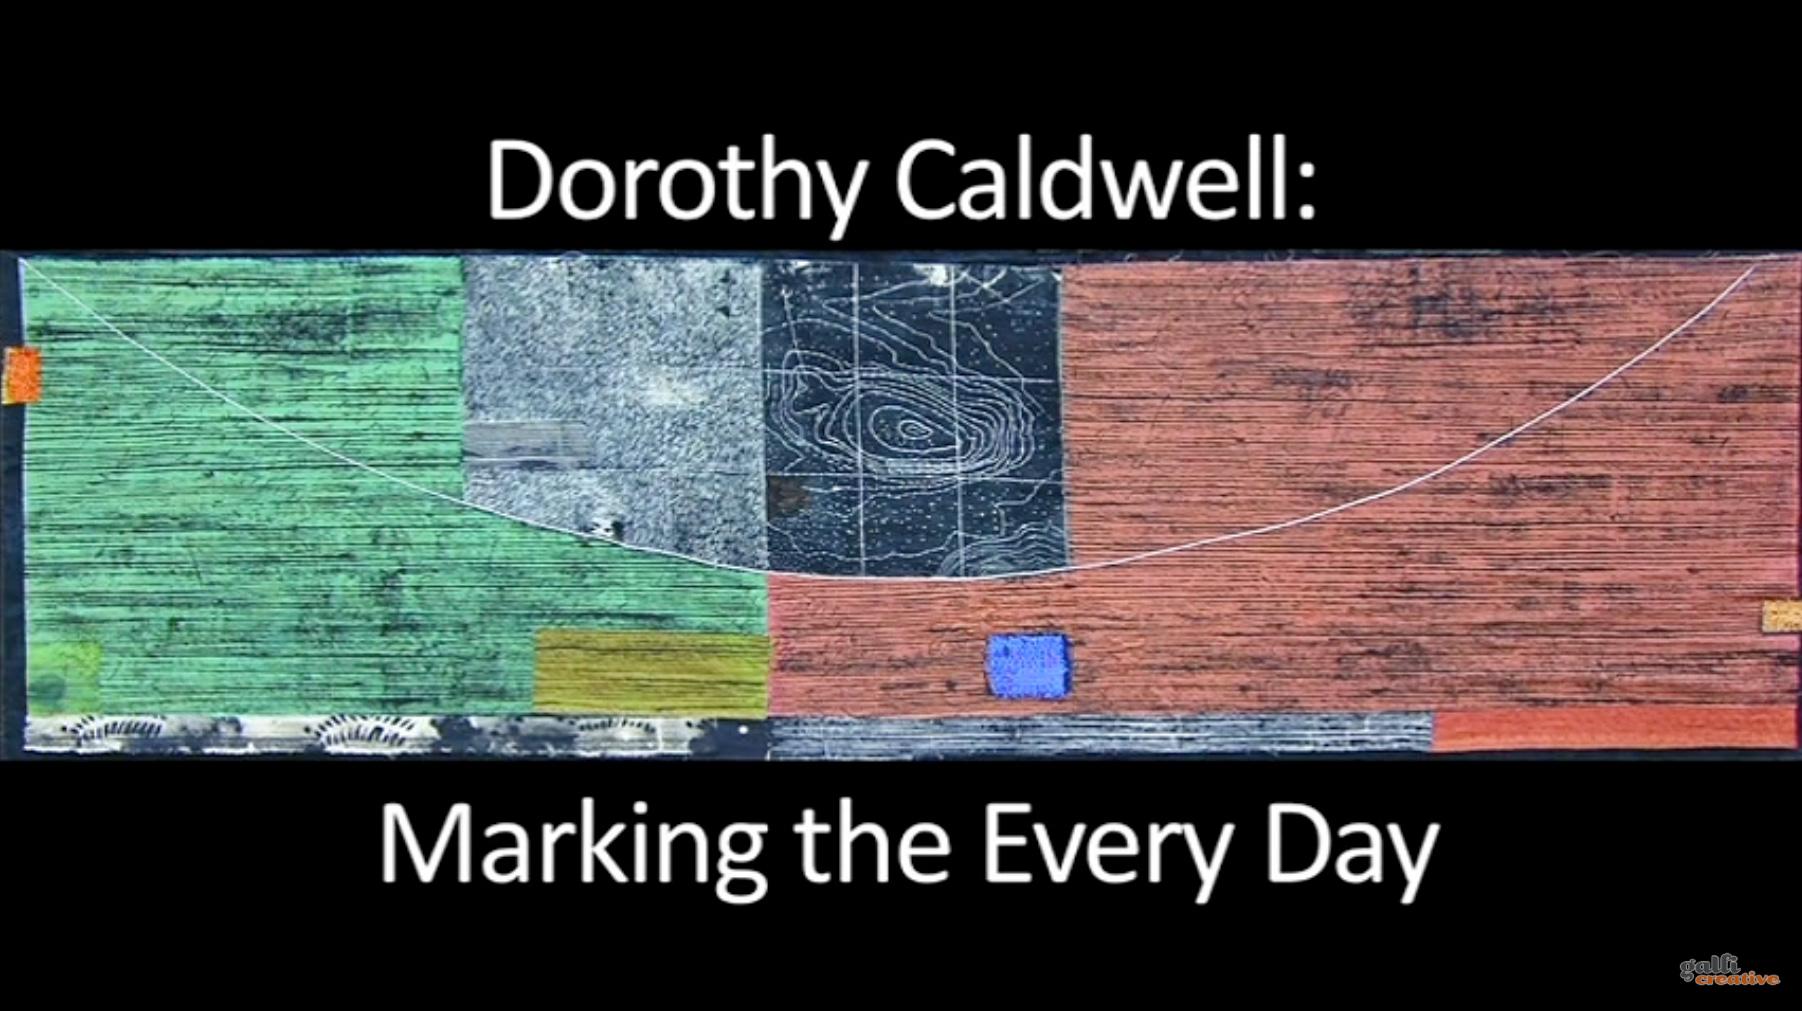 dorothy caldwell video